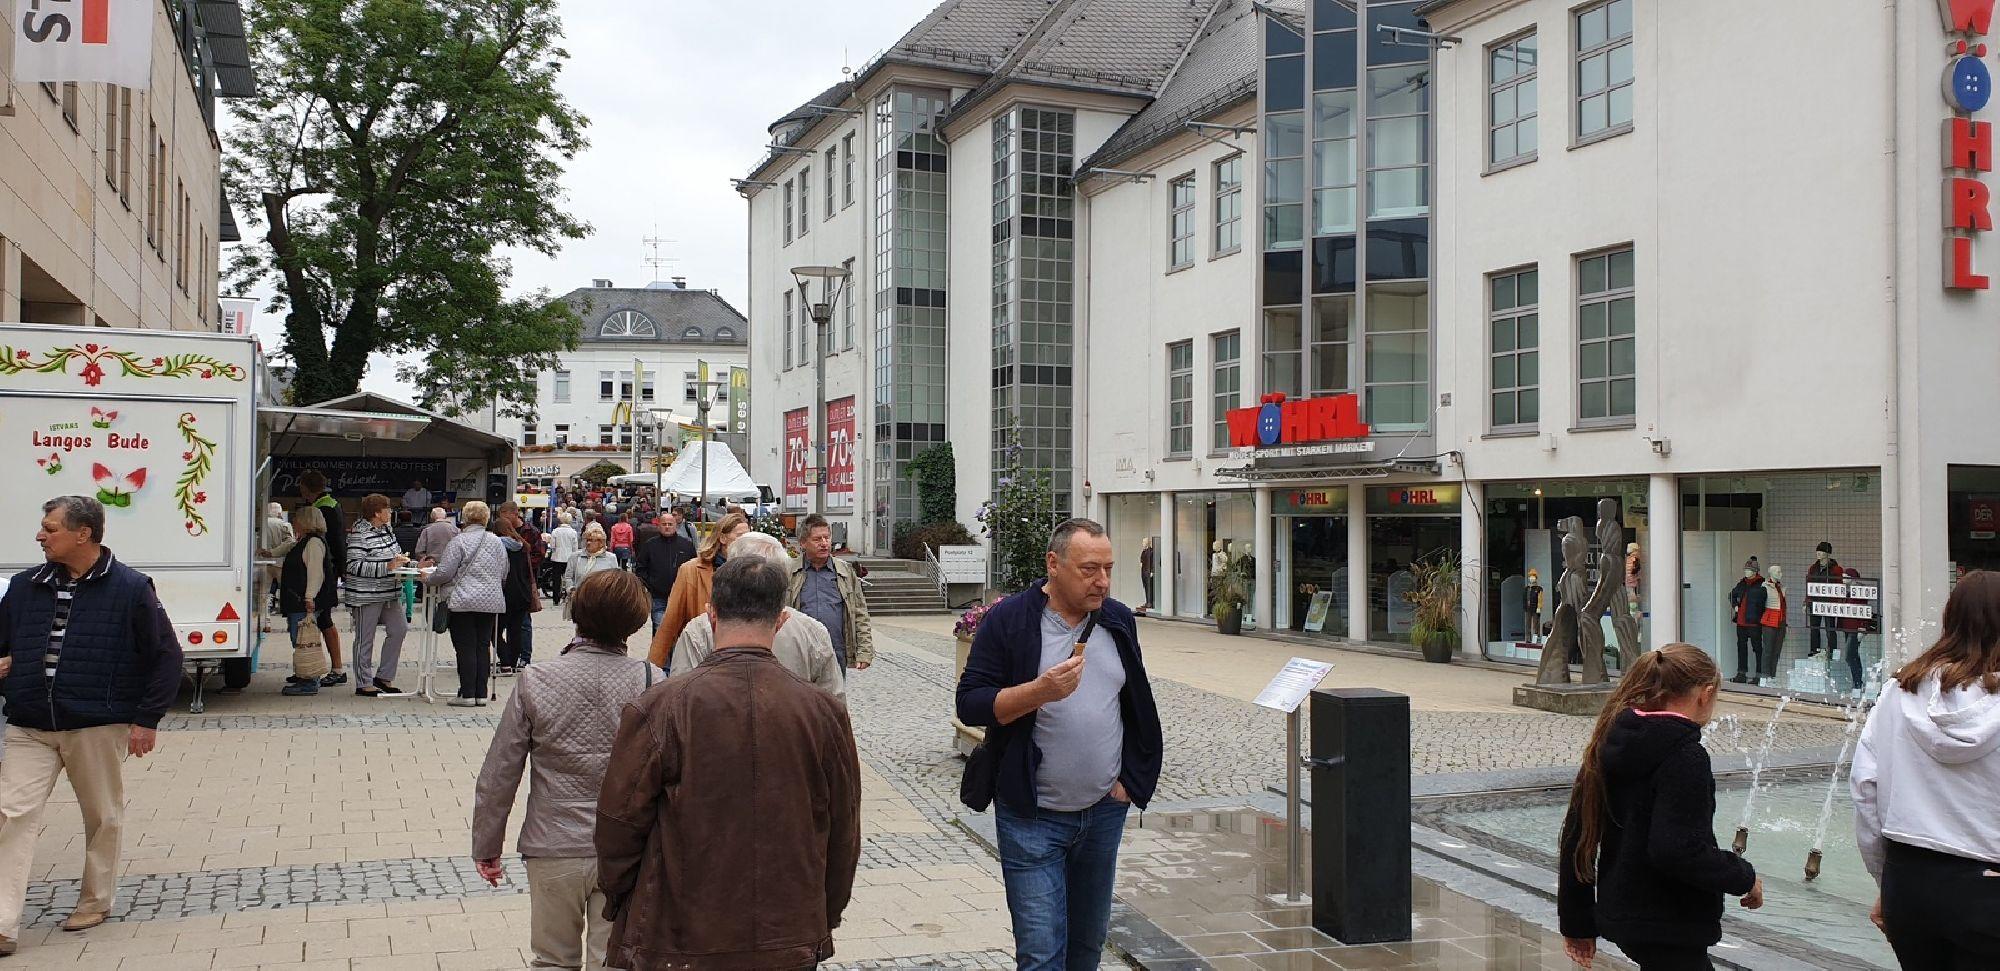 Stadtfest Plauener Frühling